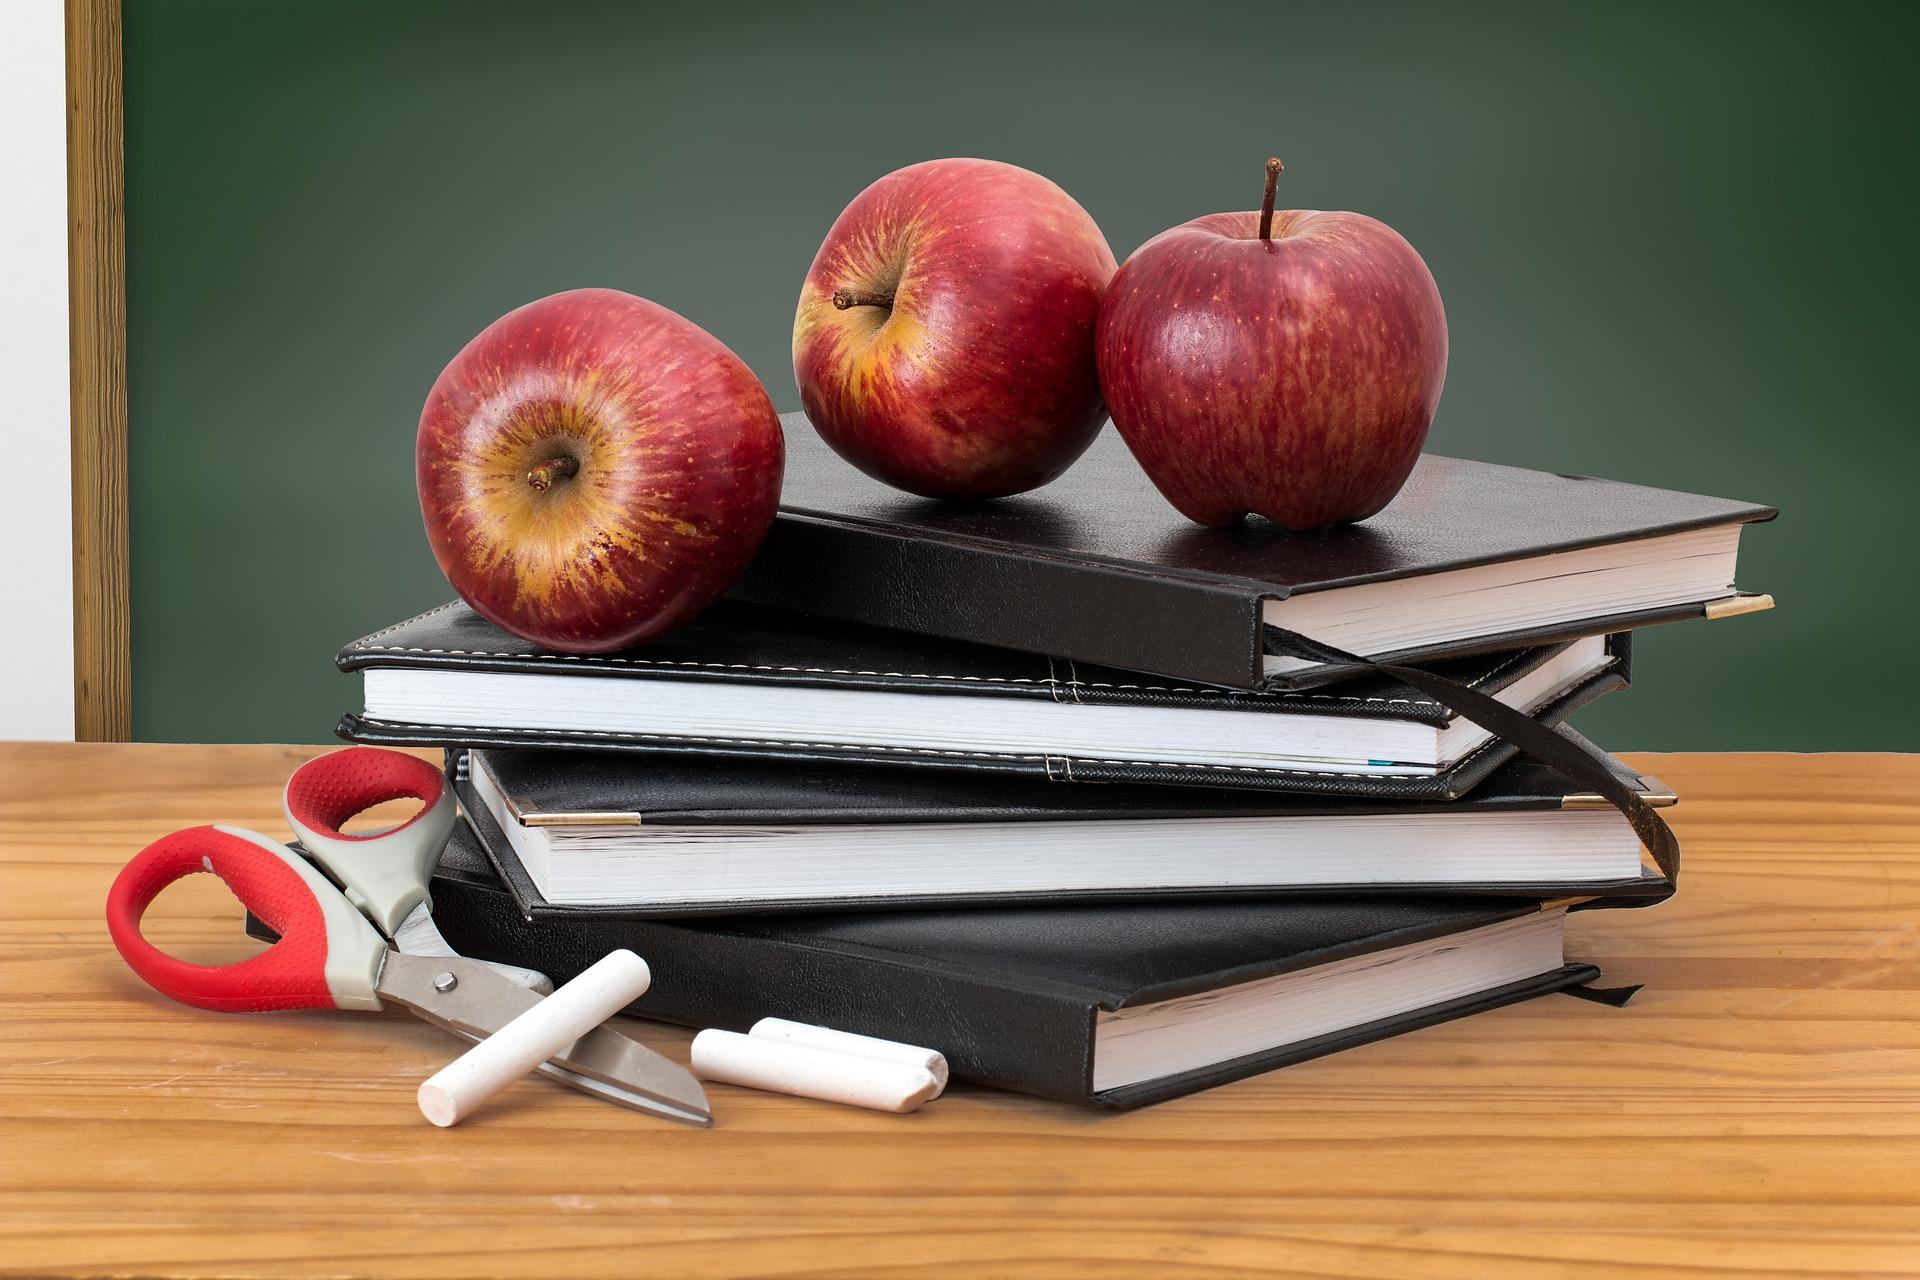 Apples on books